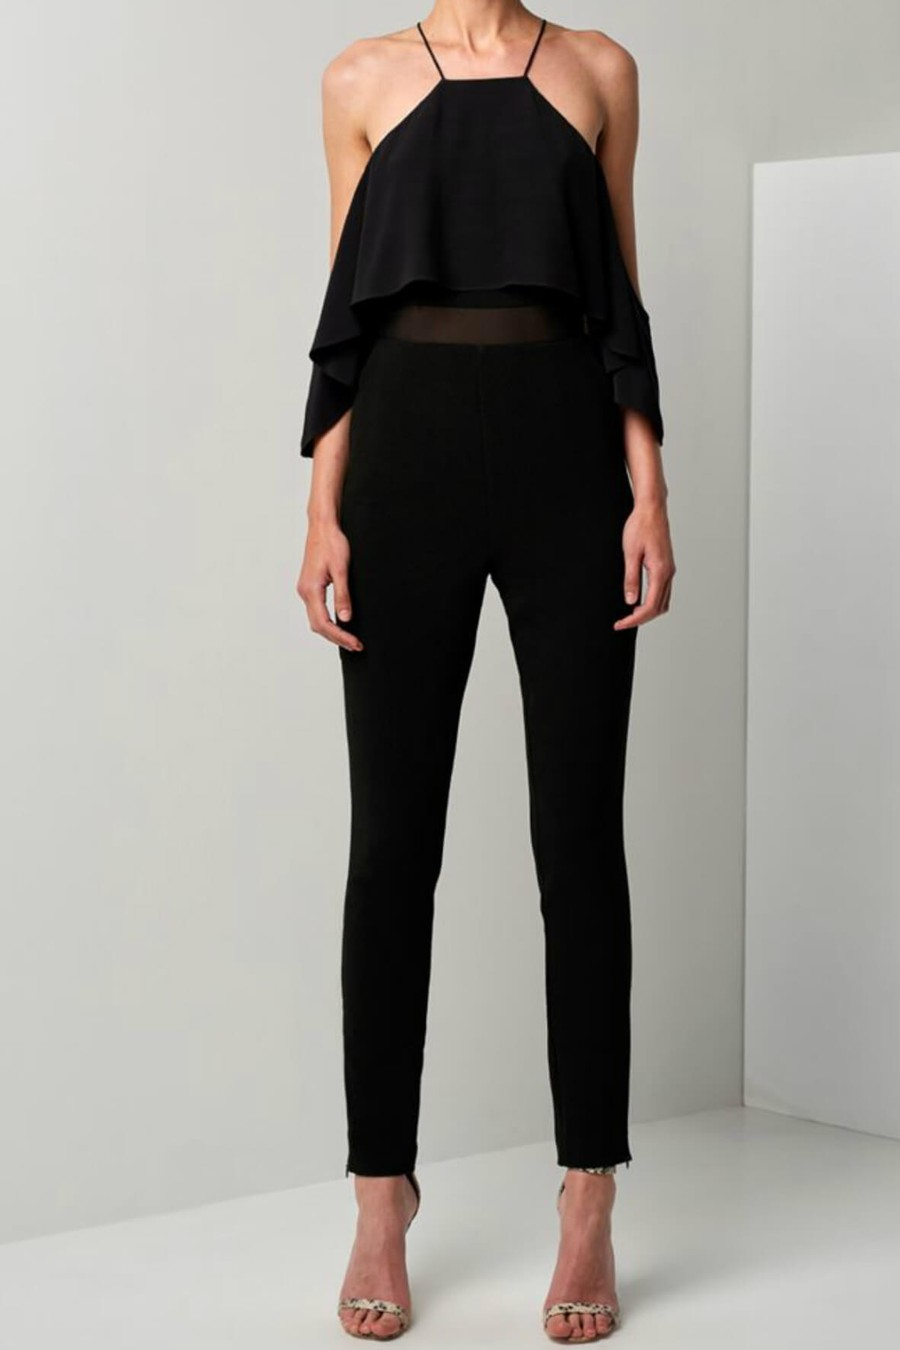 Style Theory_Crazy Rich Asians_quiz_ststudio-open-shoulder-jumpsuit-3